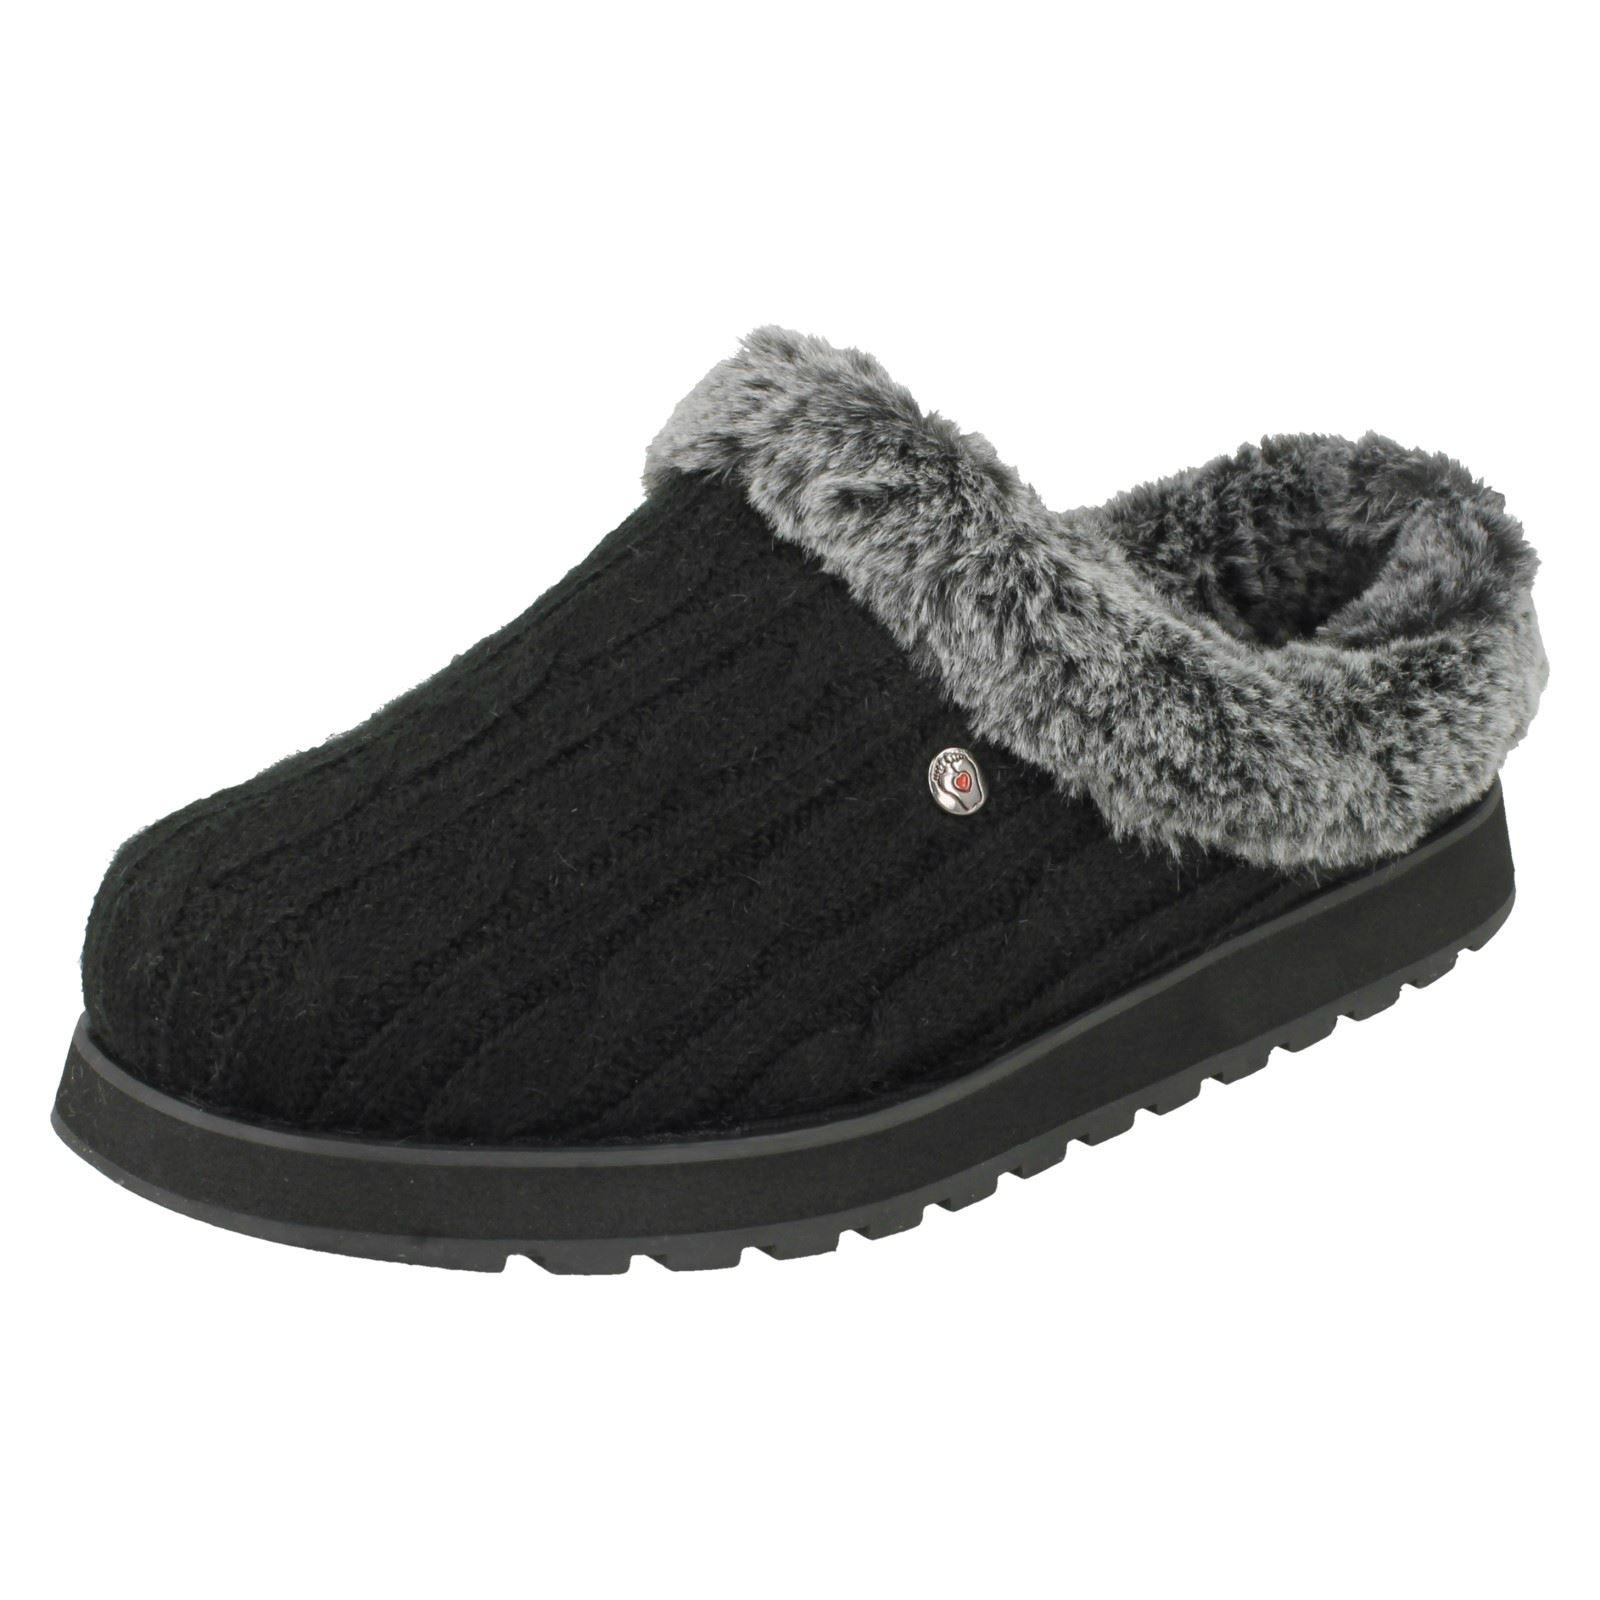 Kleidung & Accessoires Hausschuhe Ladies Bobs Skechers Ice Angel Slip On Memory Foam Indoor Winter Mule Slippers